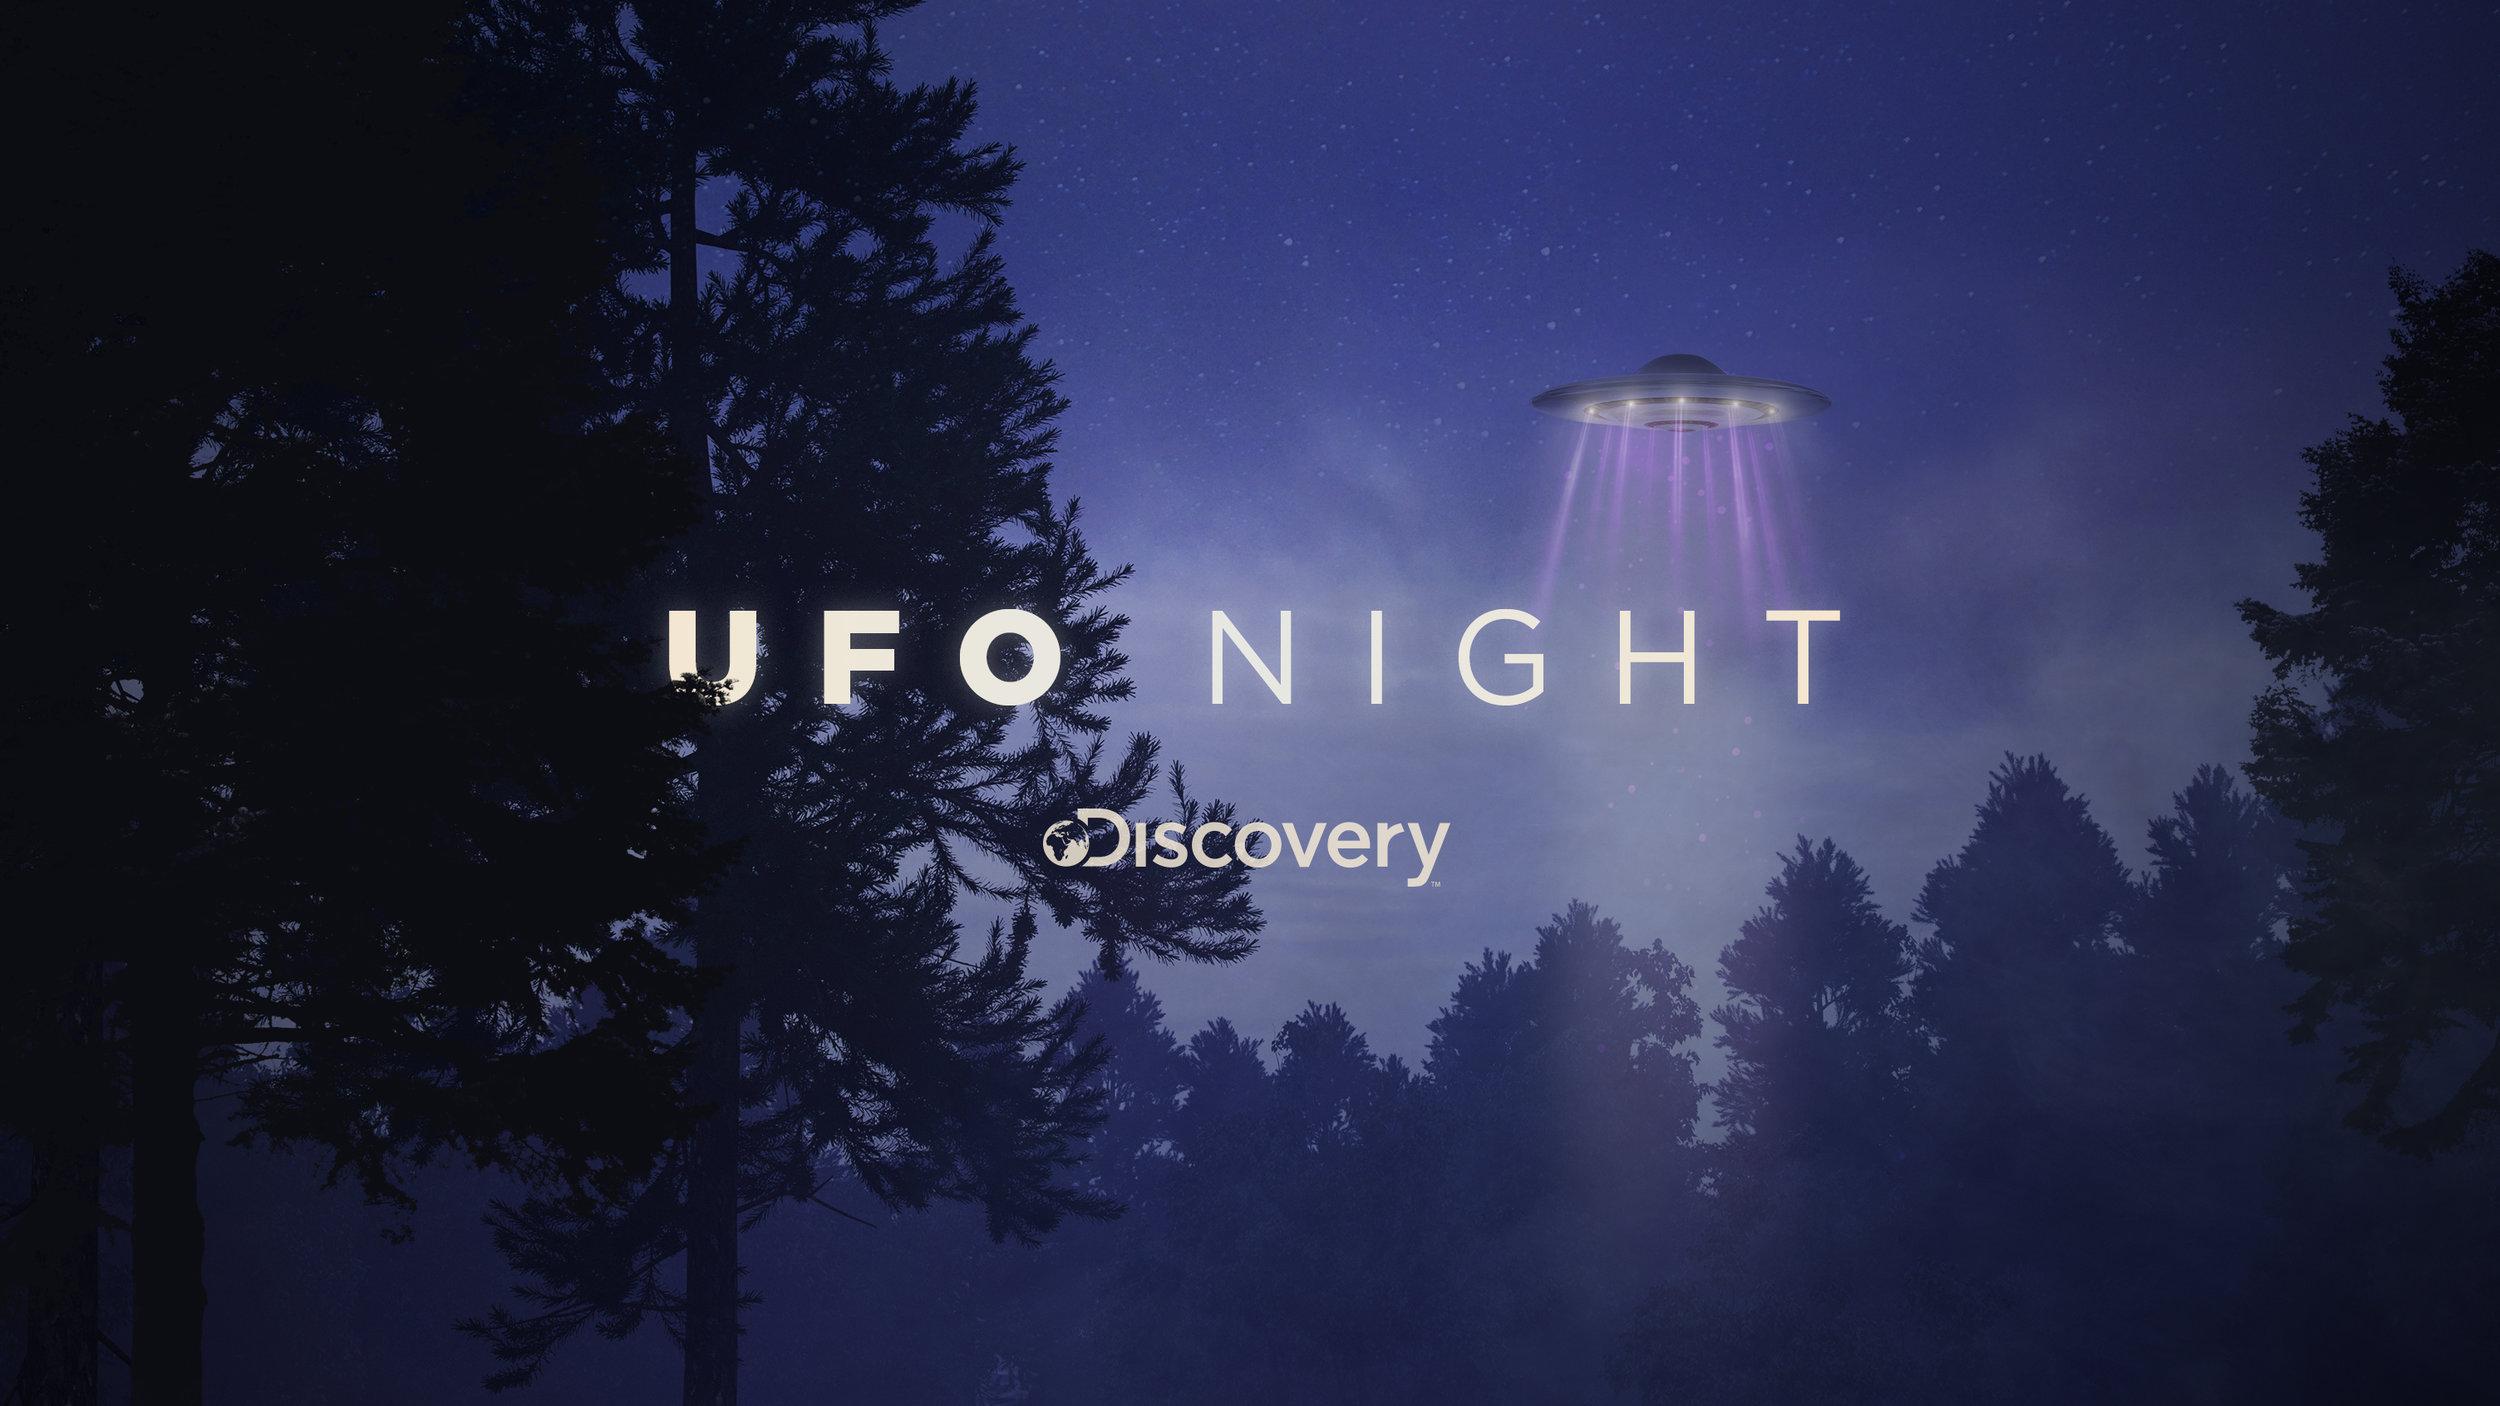 MASTER_UFO_NIGHT_16x9_TITLE.jpg